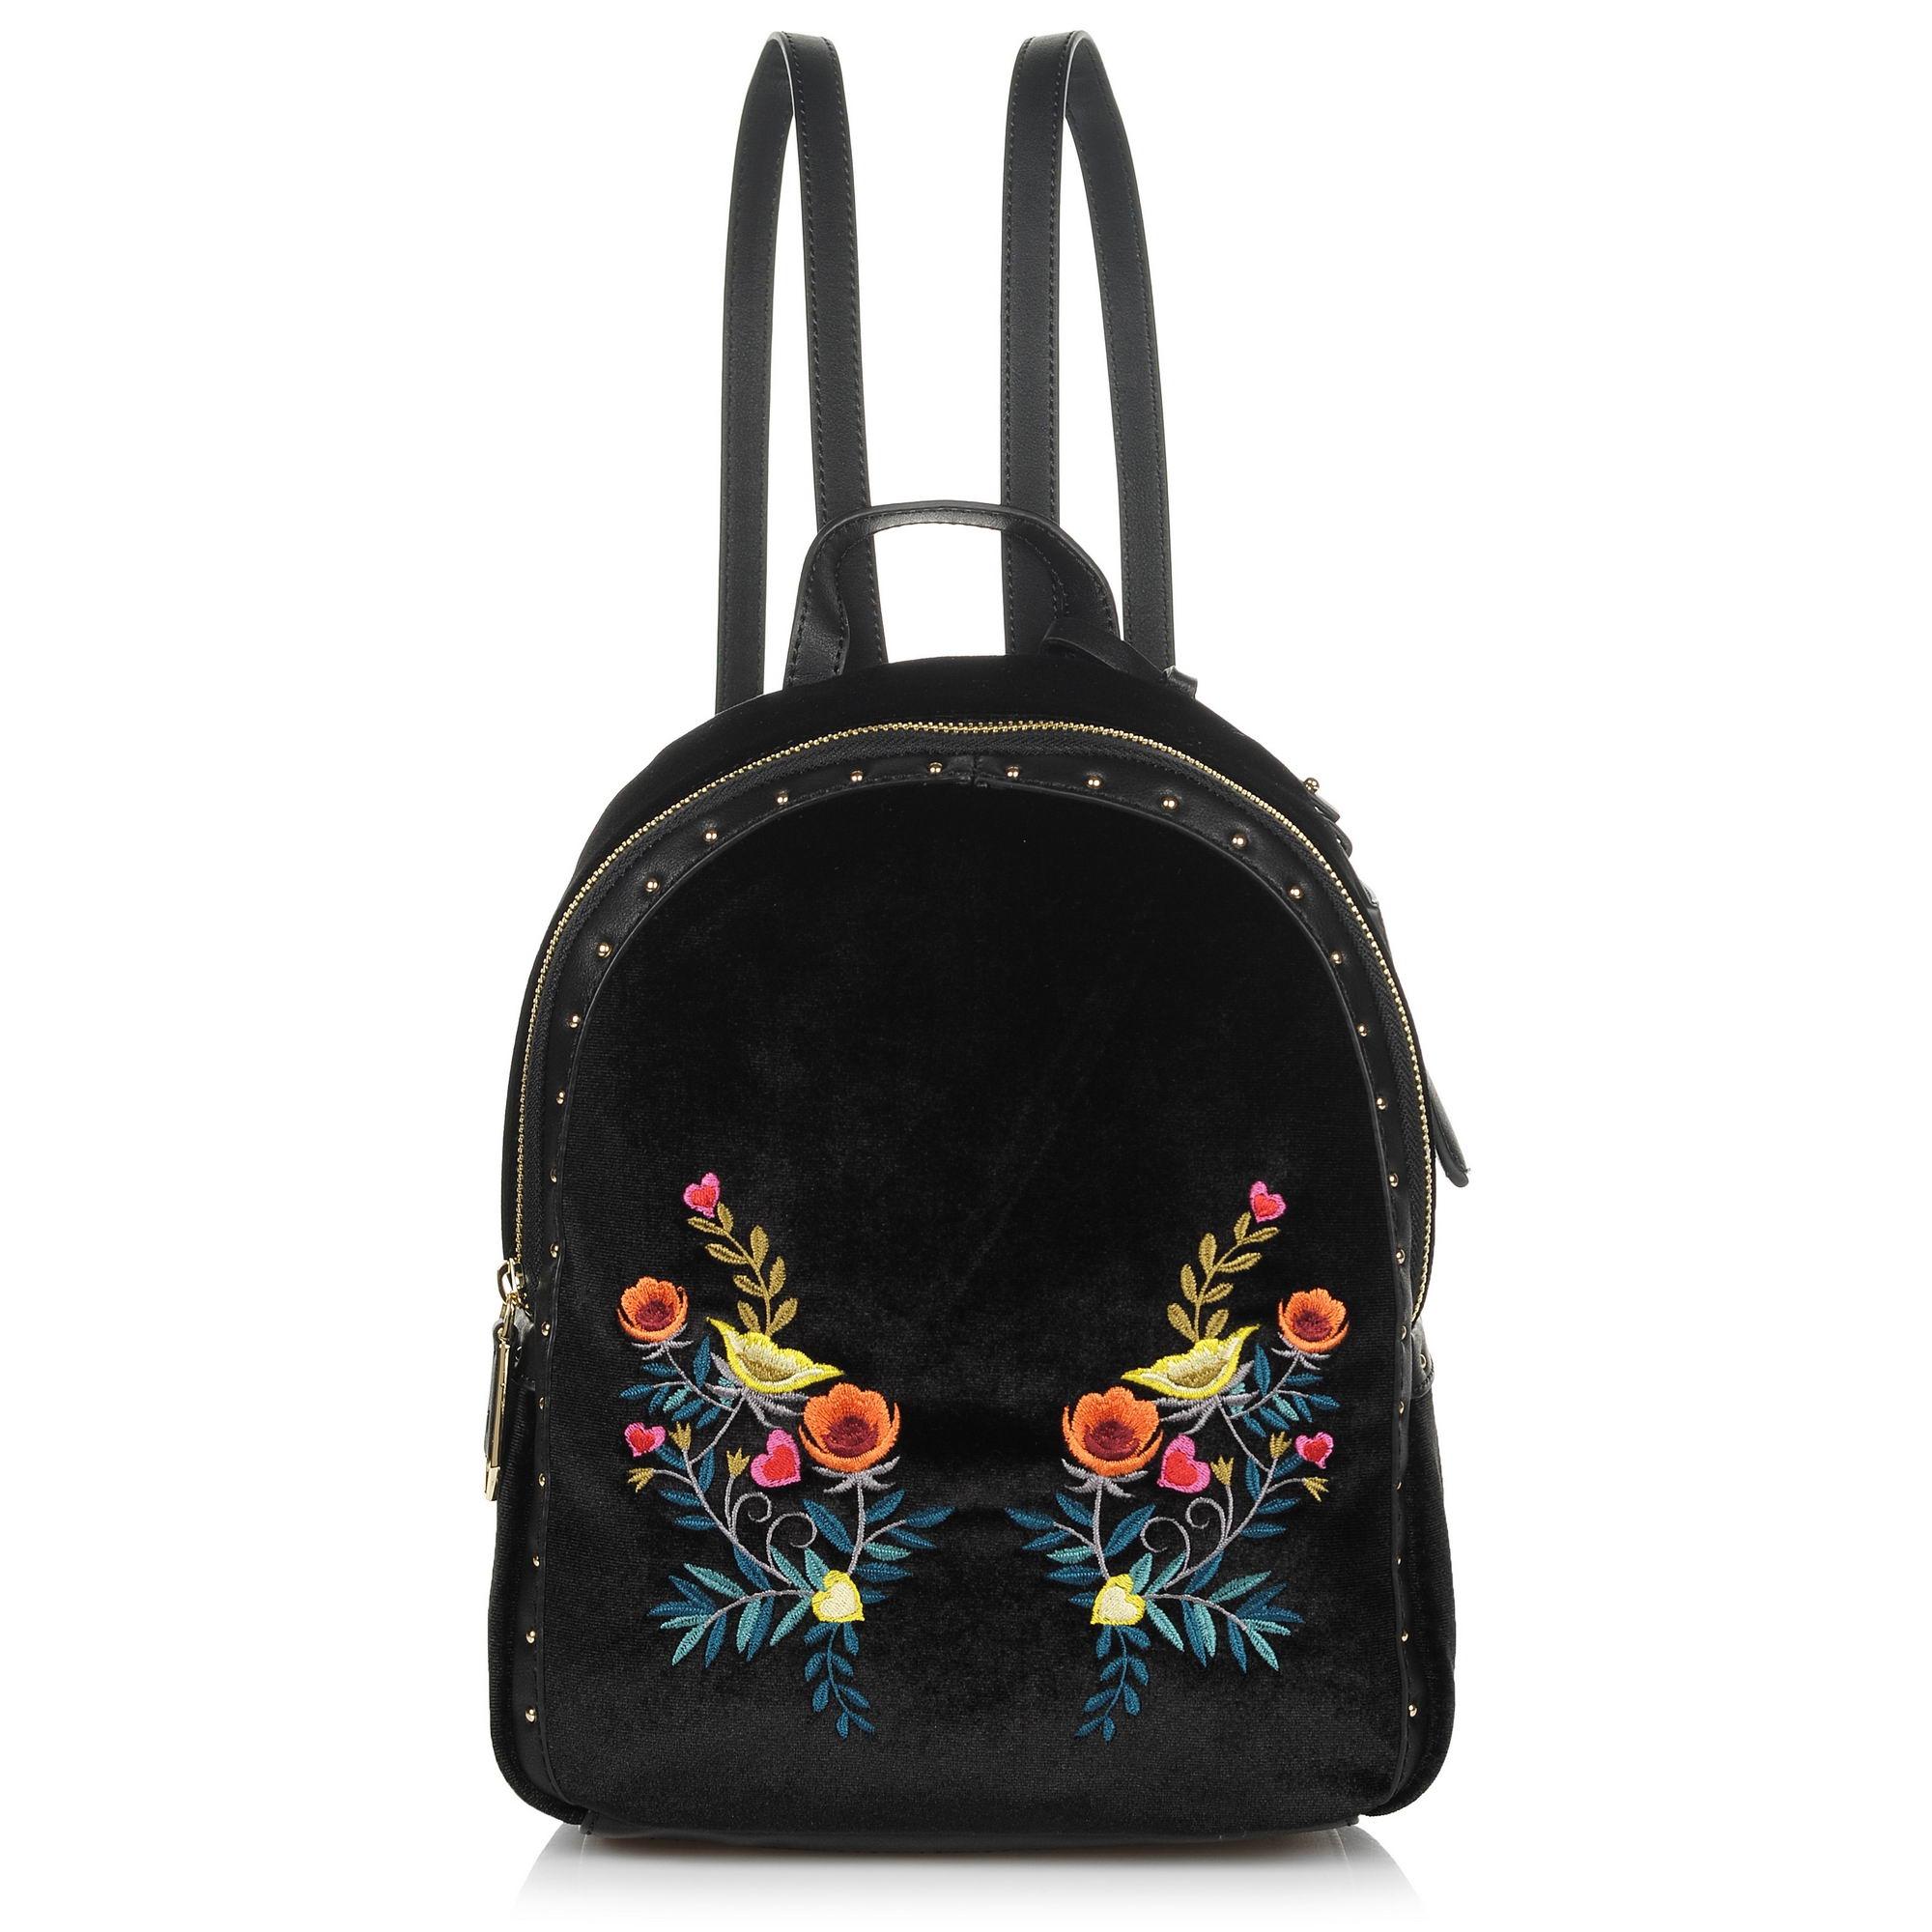 c72f84c8eb Σακίδιο Πλάτης Trussardi Jeans Portulaca Backpack Velvet Embrpoidery  75B00539